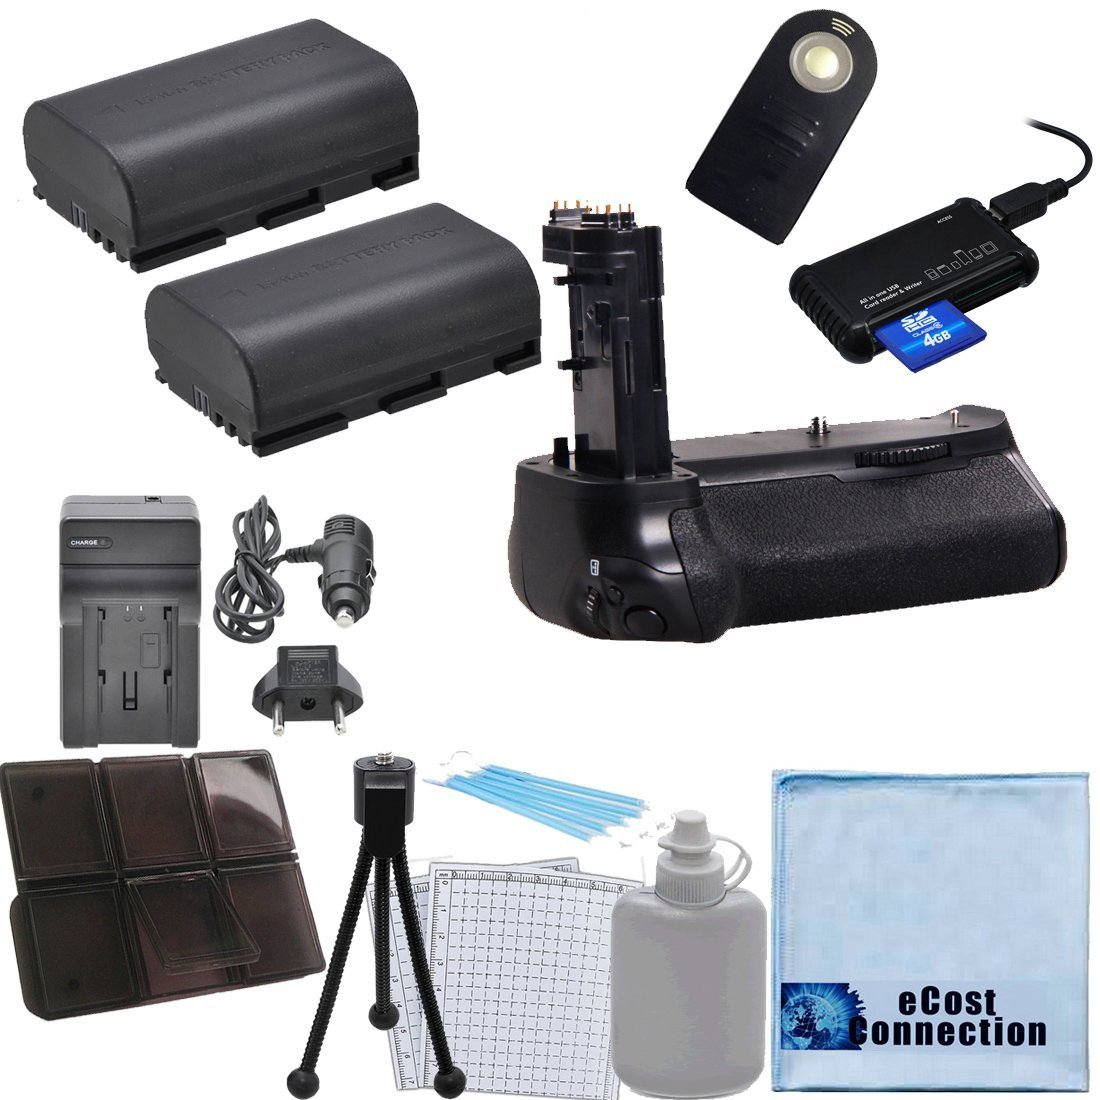 Battery Grip for Canon EOS 7D Mark II DSLR Camera Car//Home Charger Memory Card Reader Deluxe eCost Starter Kit Remote Control Shutter BG-E16 2 LP-E6 Batteries